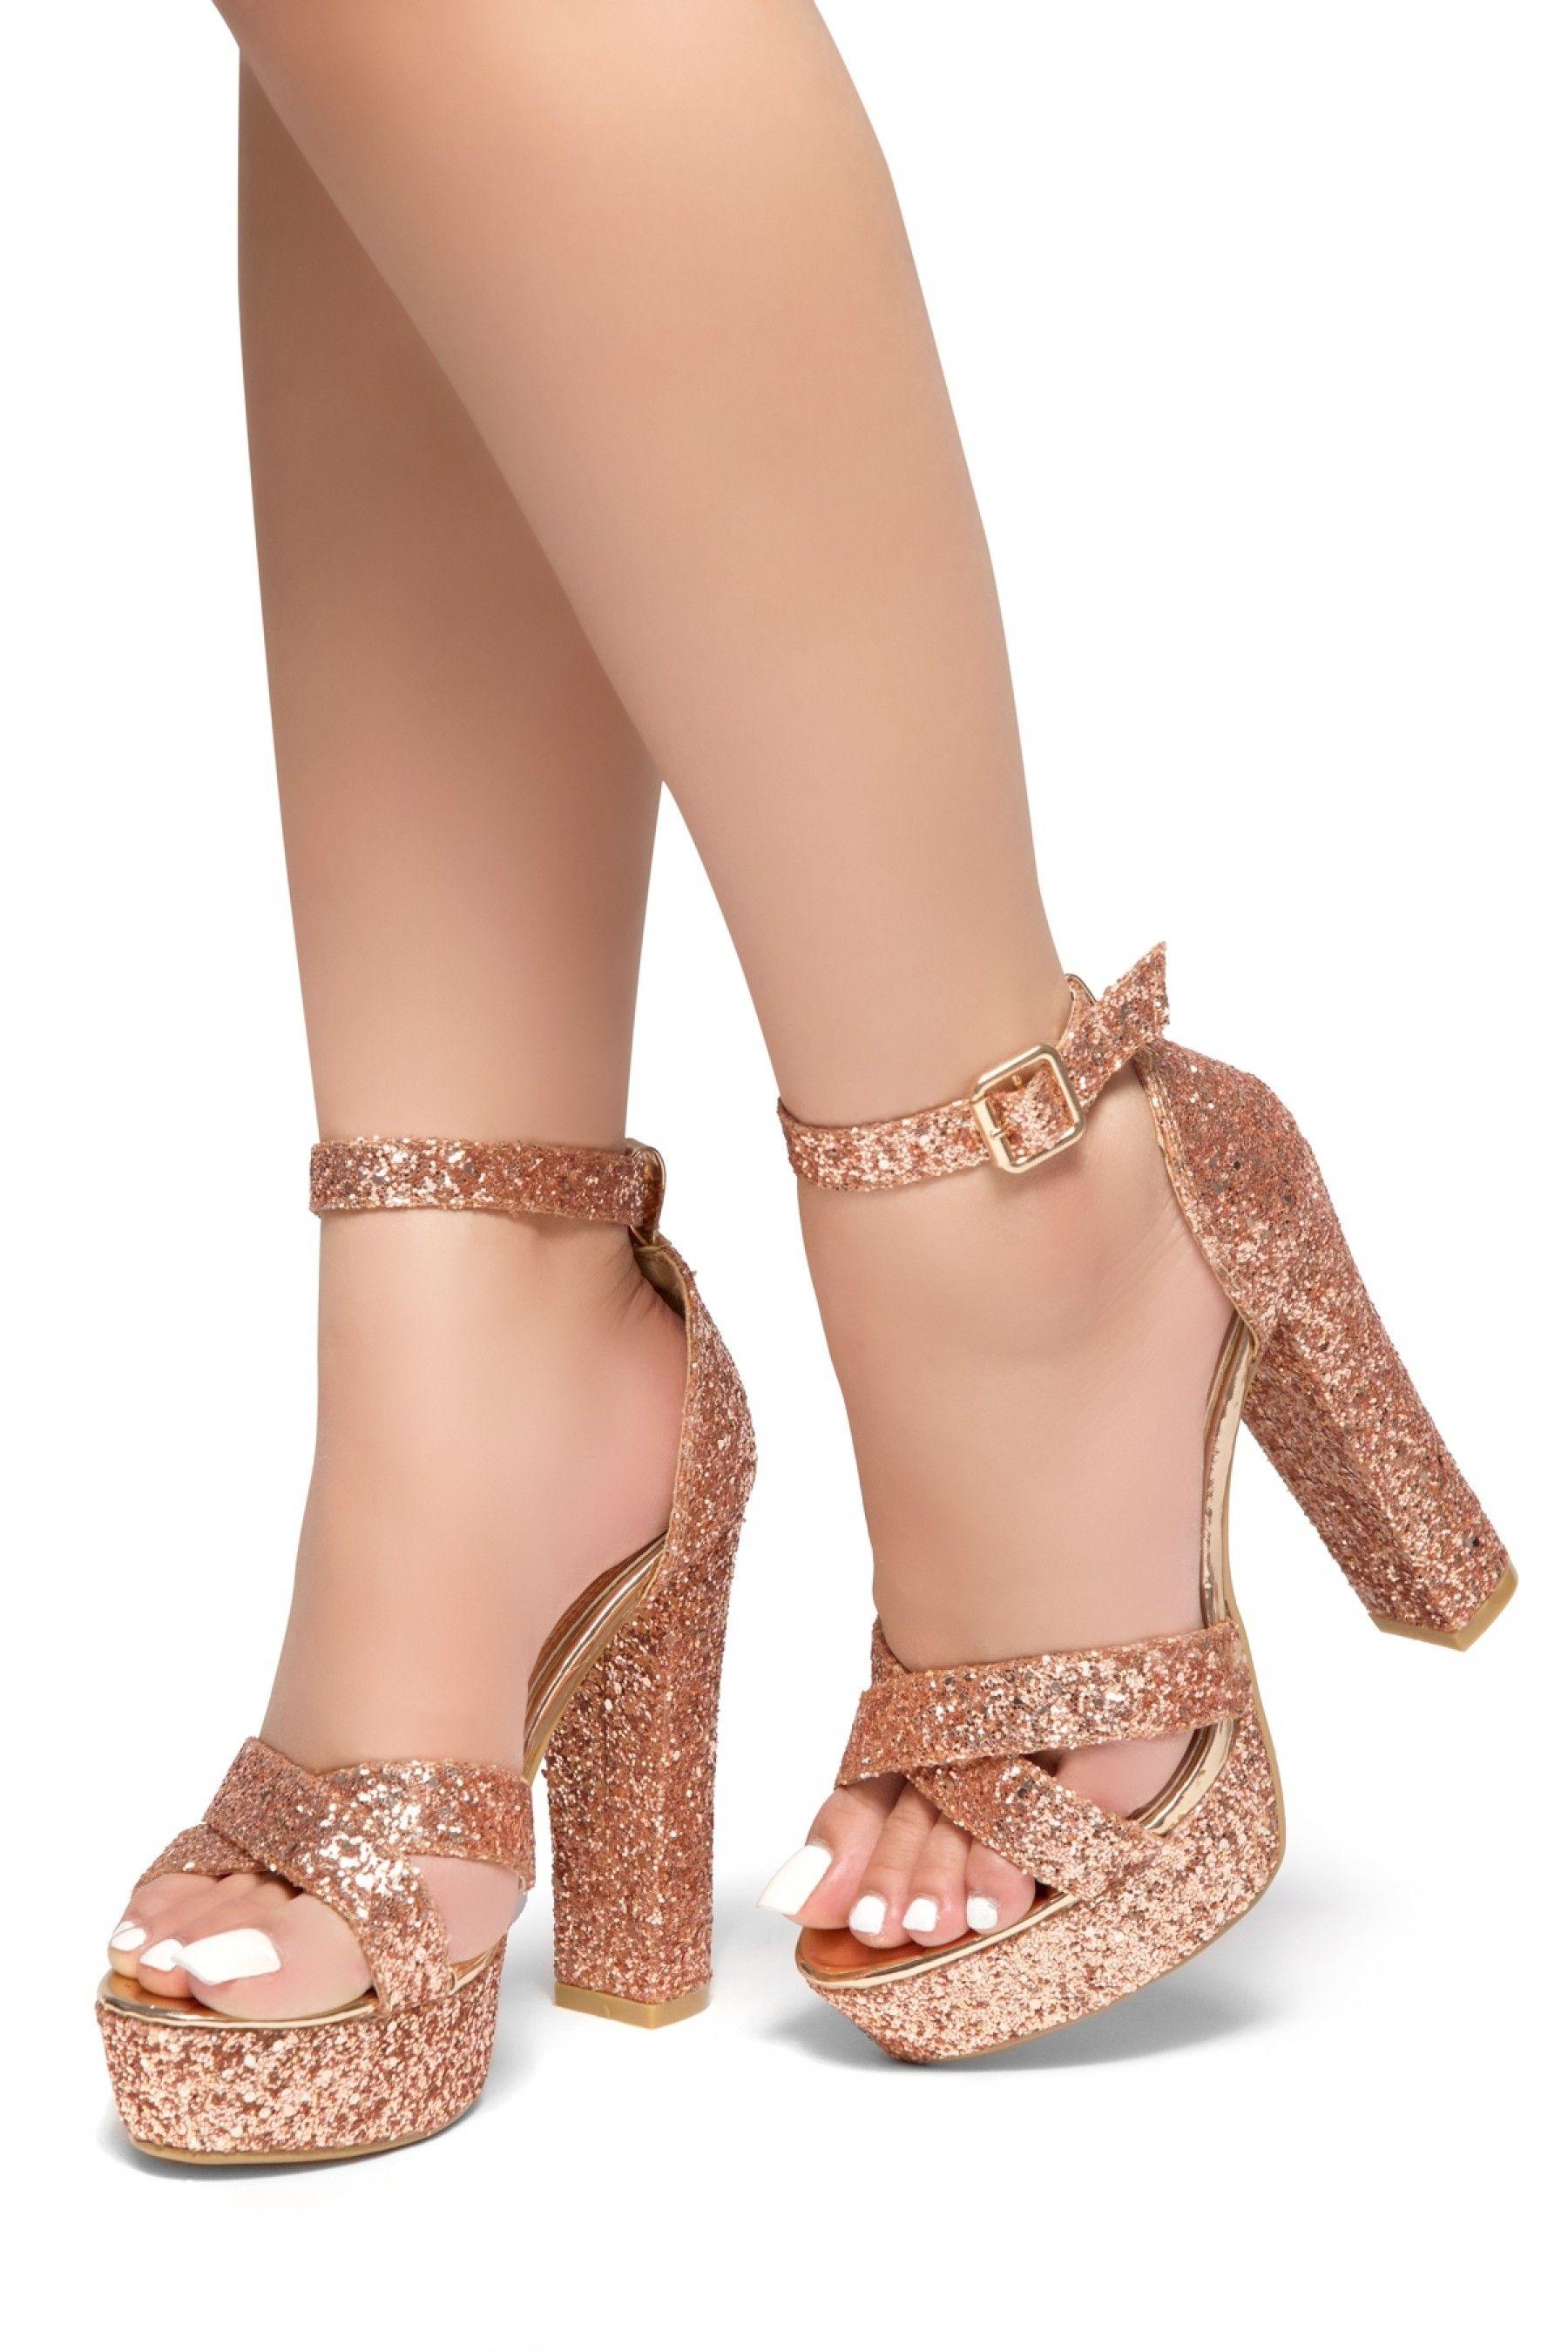 b46f77a34b155 HerStyle PLAY DATE-Glitter with platform sandals (RoseGold Glitter ...